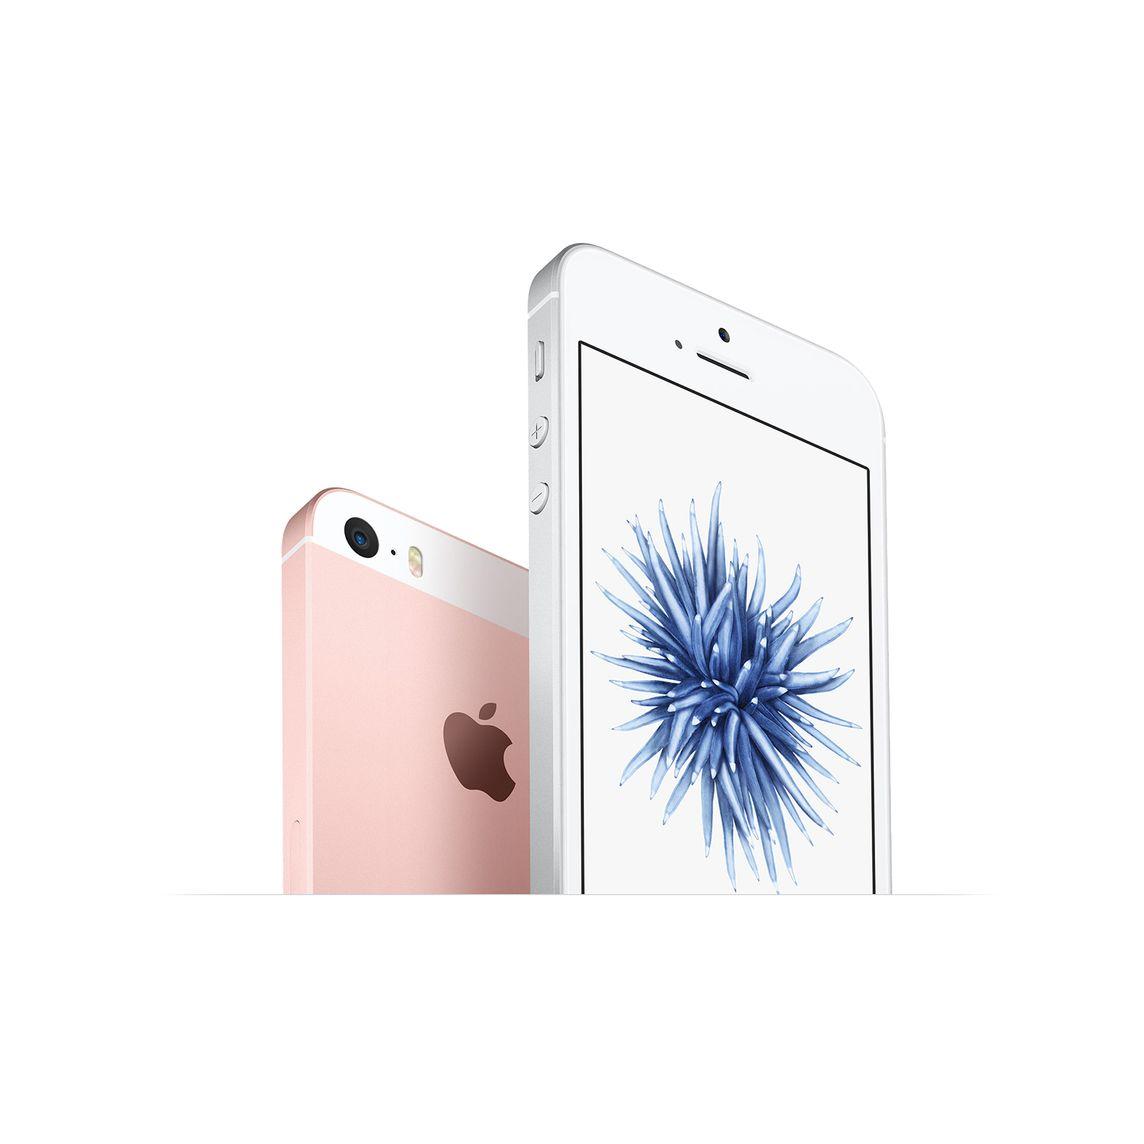 Populære iPhone SE 32GB - Rose Gold (Unlocked) - Apple OO-11